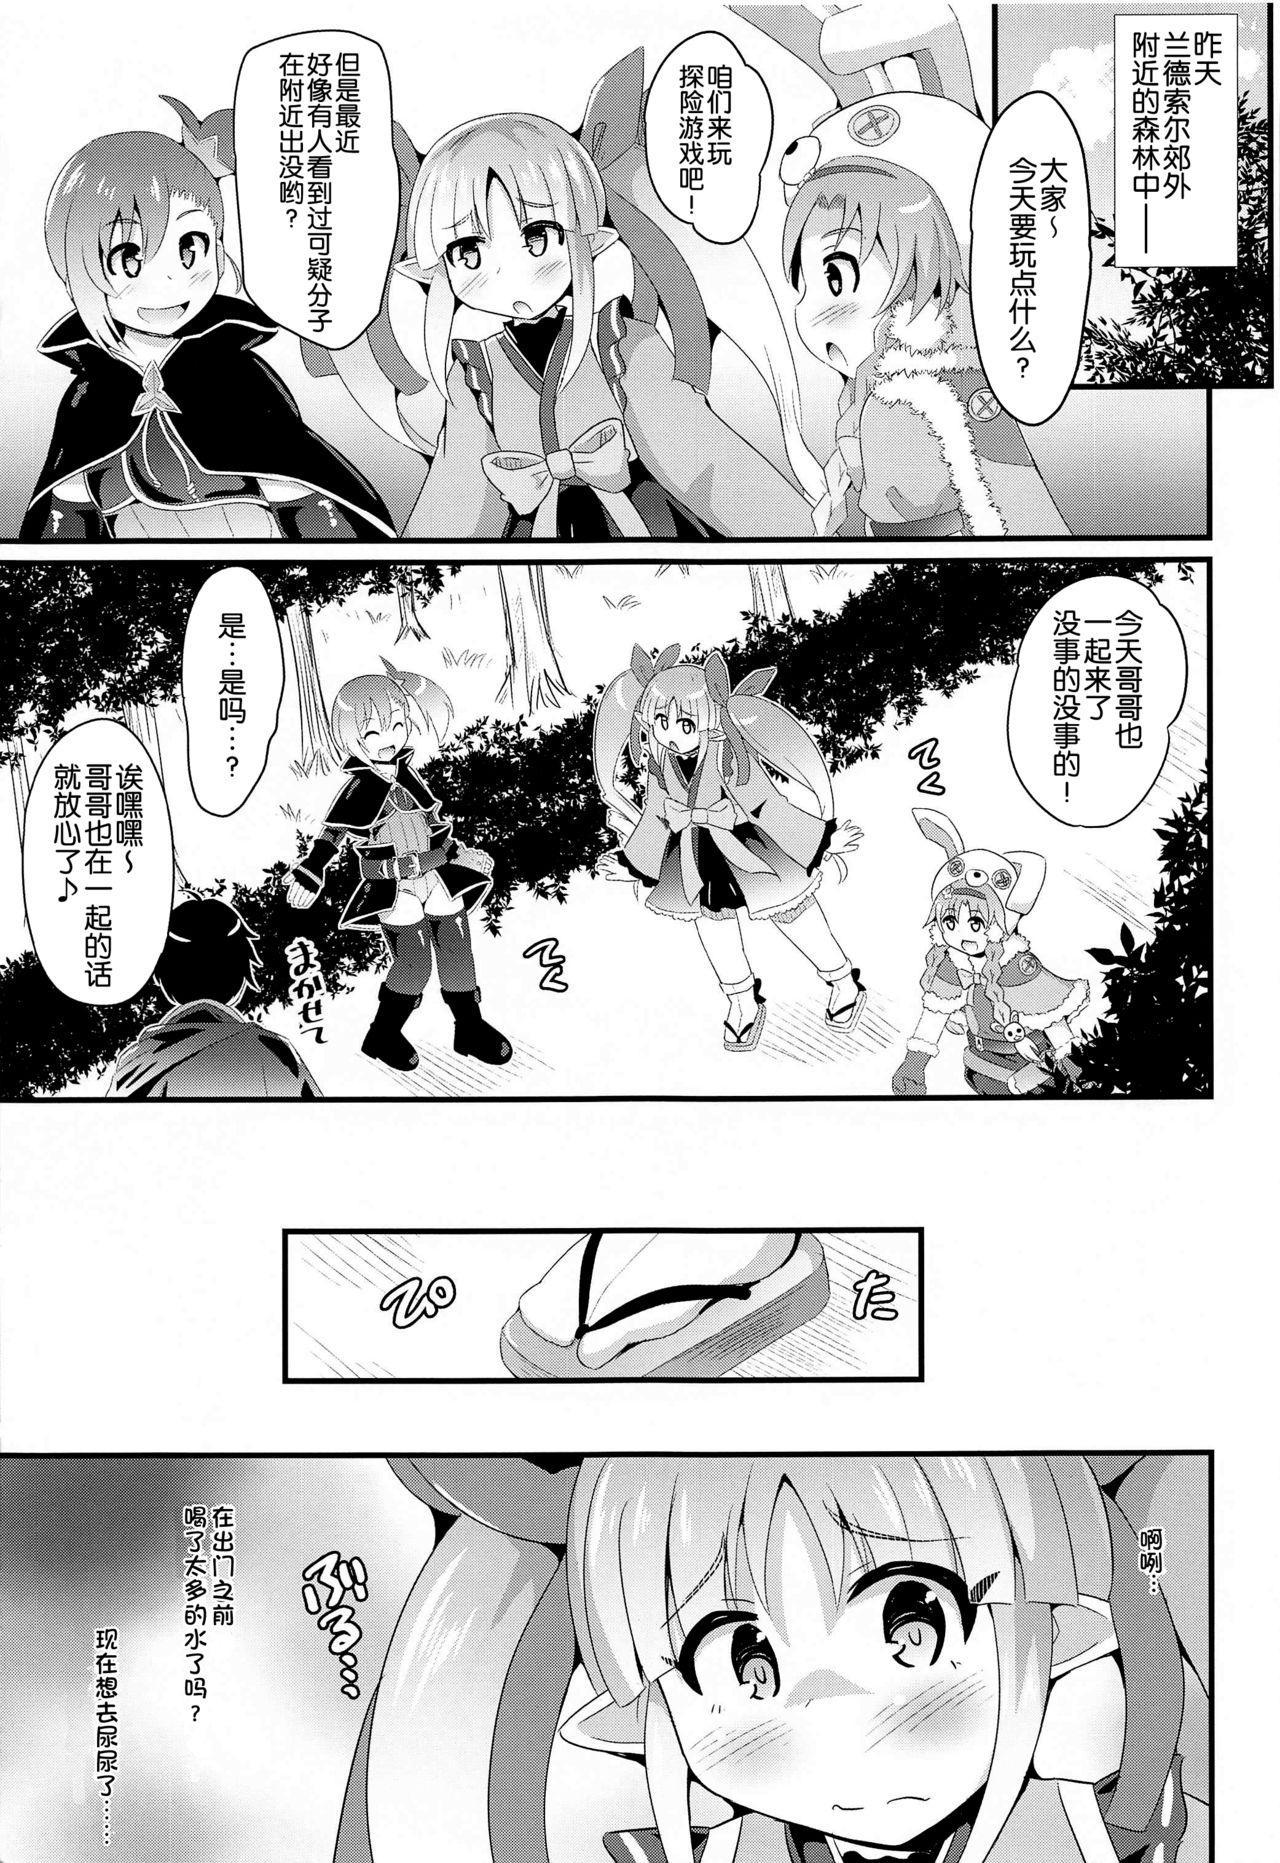 Kyouka-chan to Saimin Hentai Ecchi!! 4